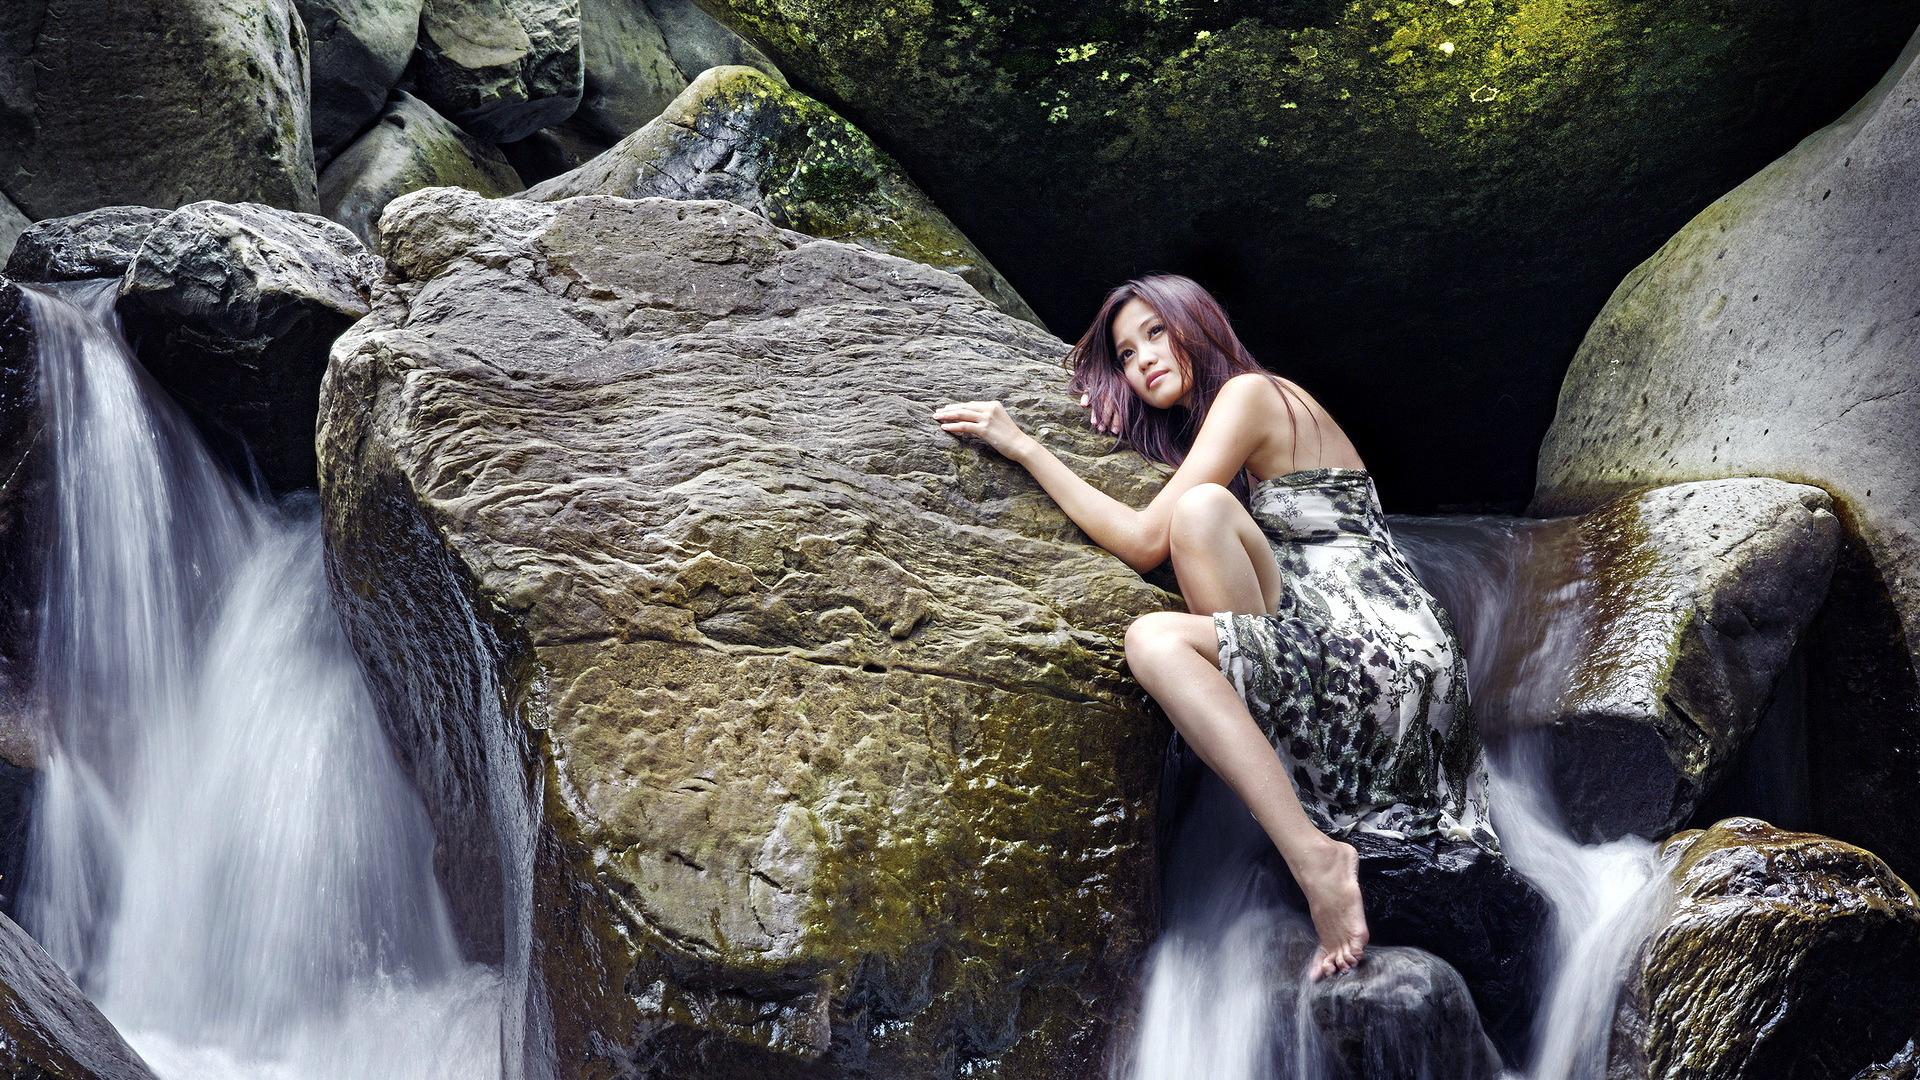 опять переживал, девушки пляшут на водопаде возрасте ценят любят